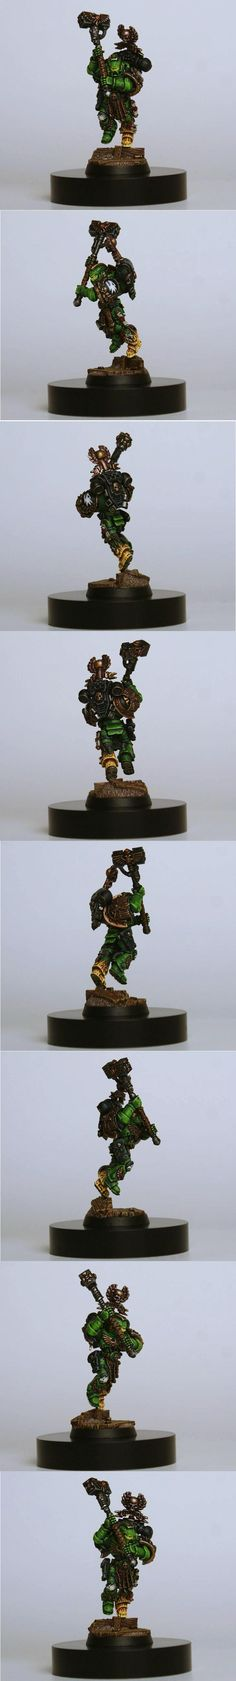 Salamander, Space Marines, Thunder Hammer